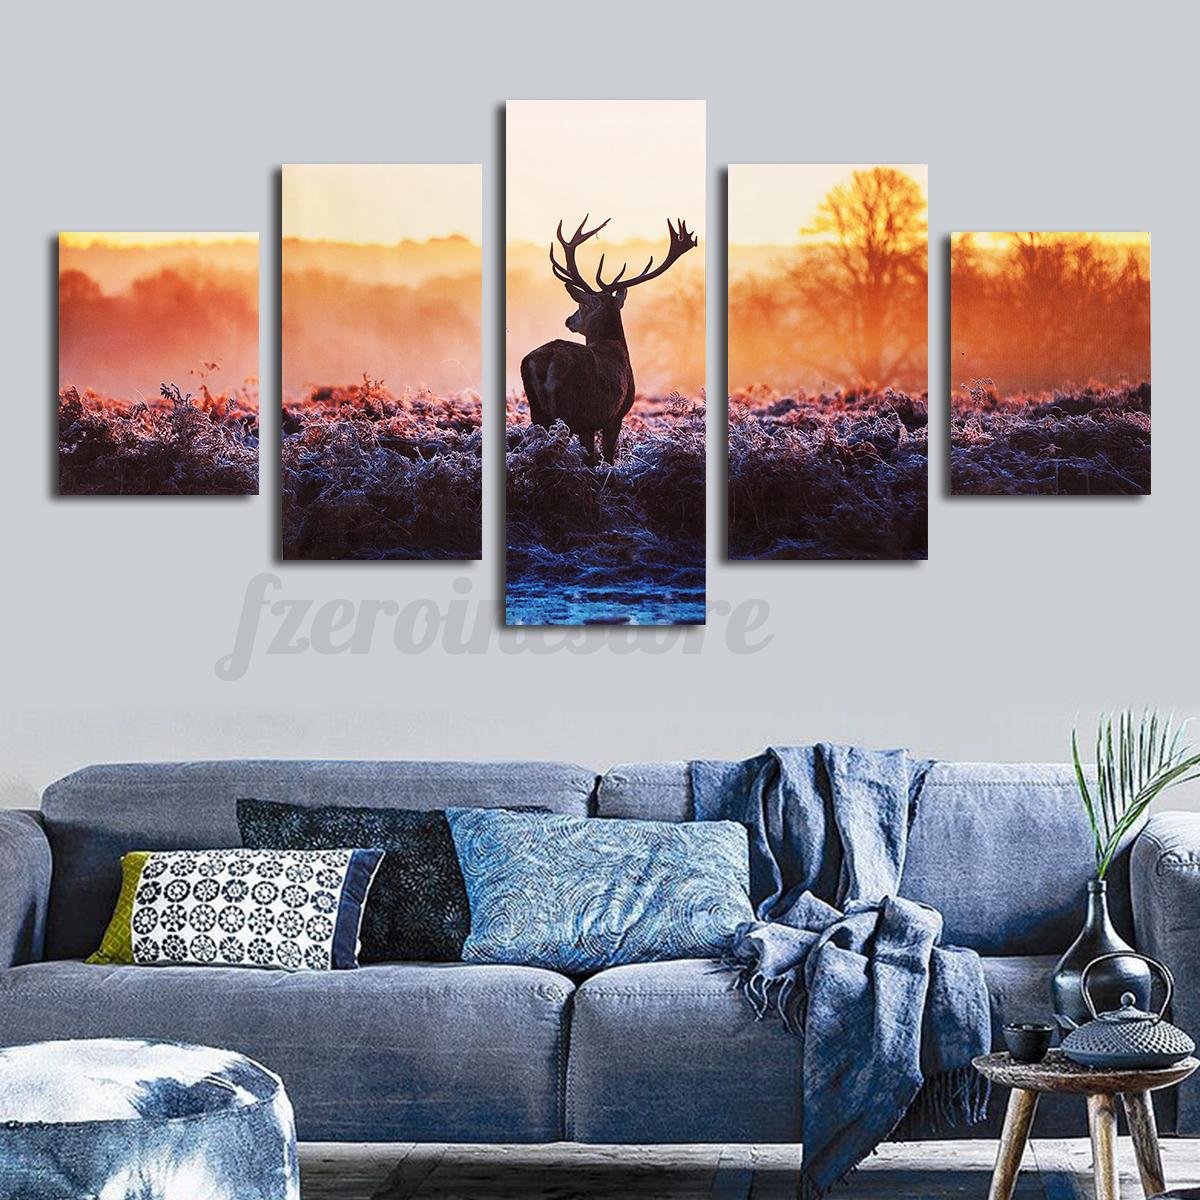 5 tlg leinwand bilder kunstdruck abstrakt wandbild bild tier see wald wand deko. Black Bedroom Furniture Sets. Home Design Ideas